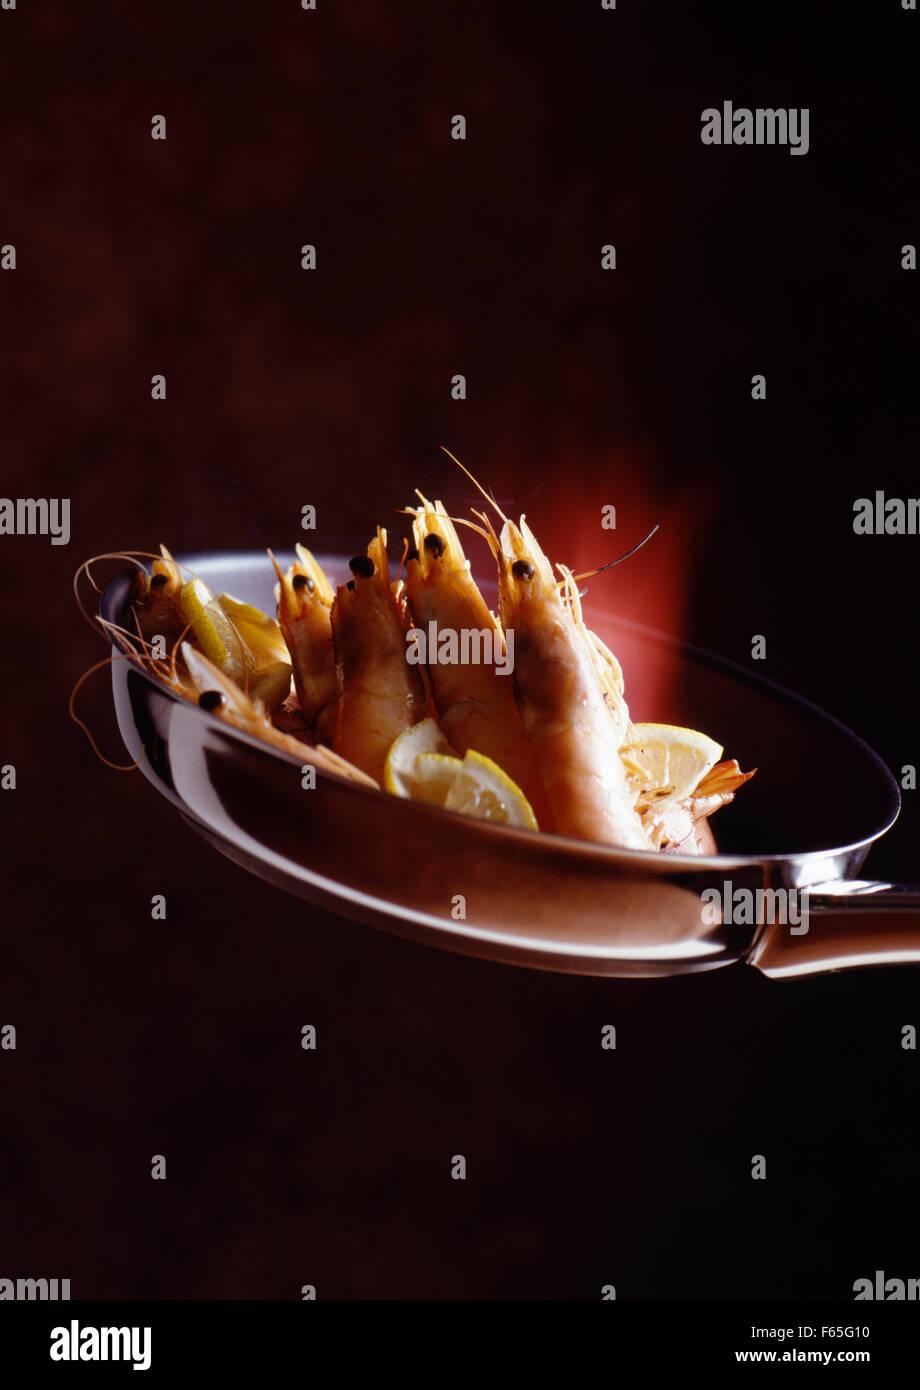 Camarones Flambéed Foto de stock